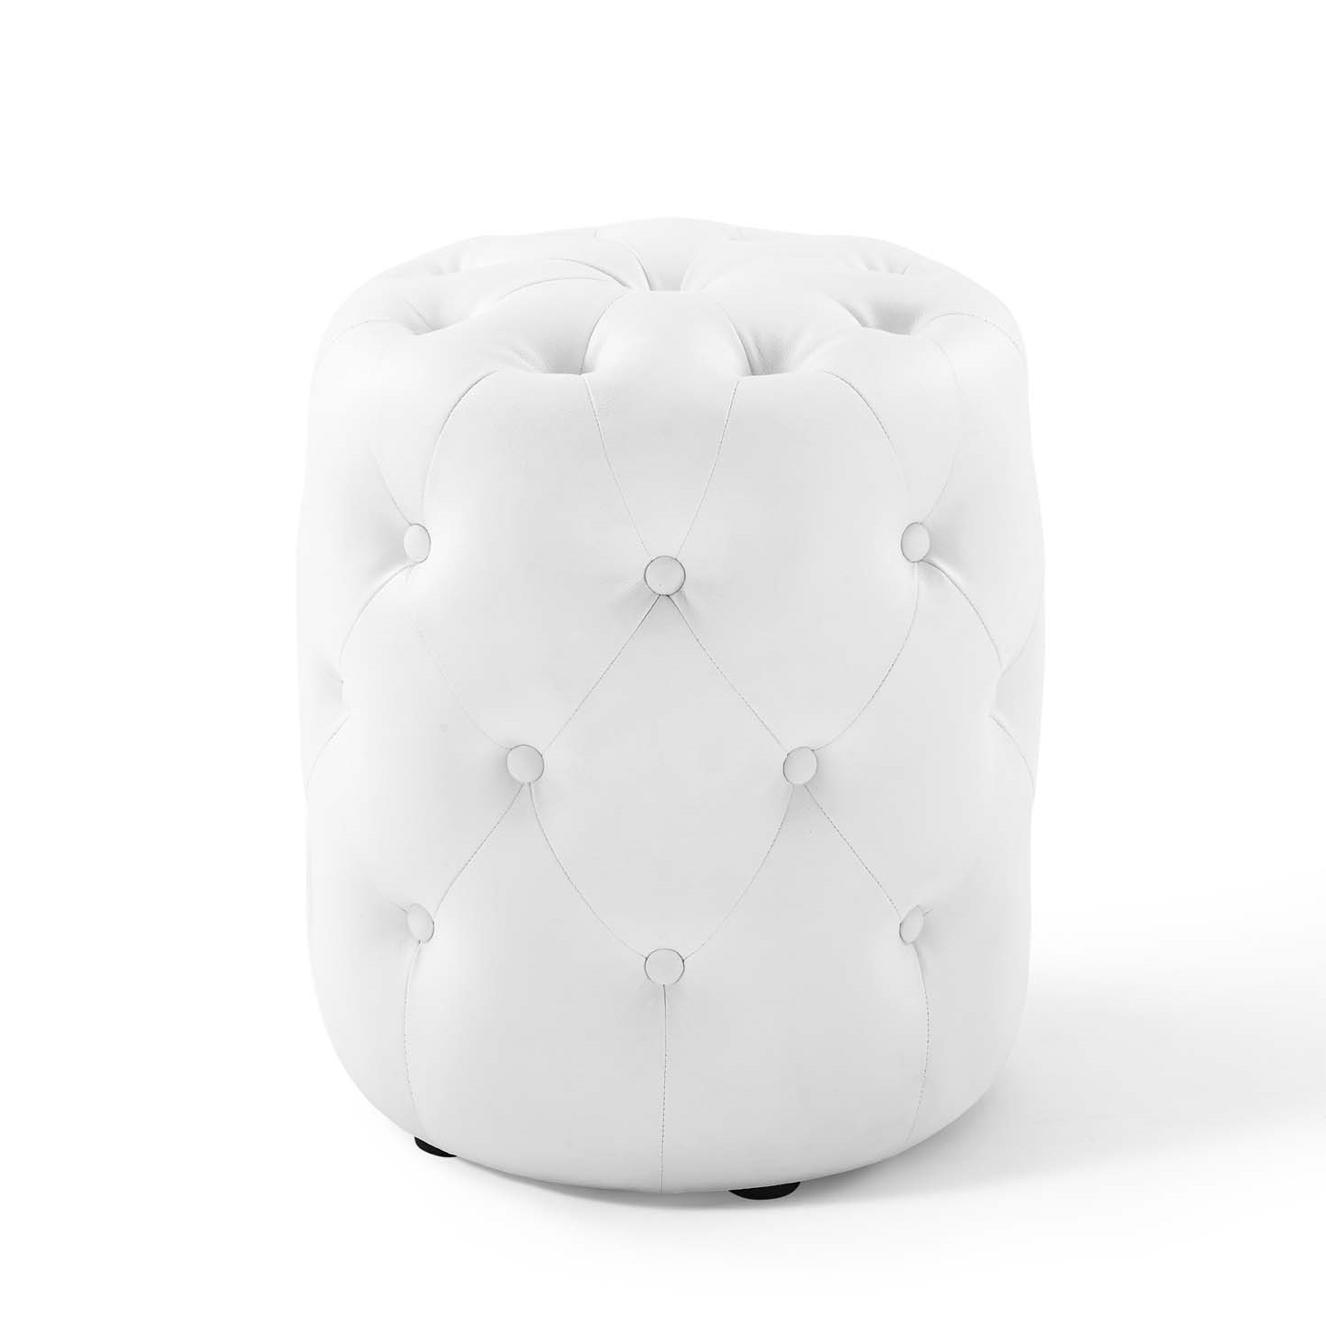 White Leather Rd. Ottoman - $40